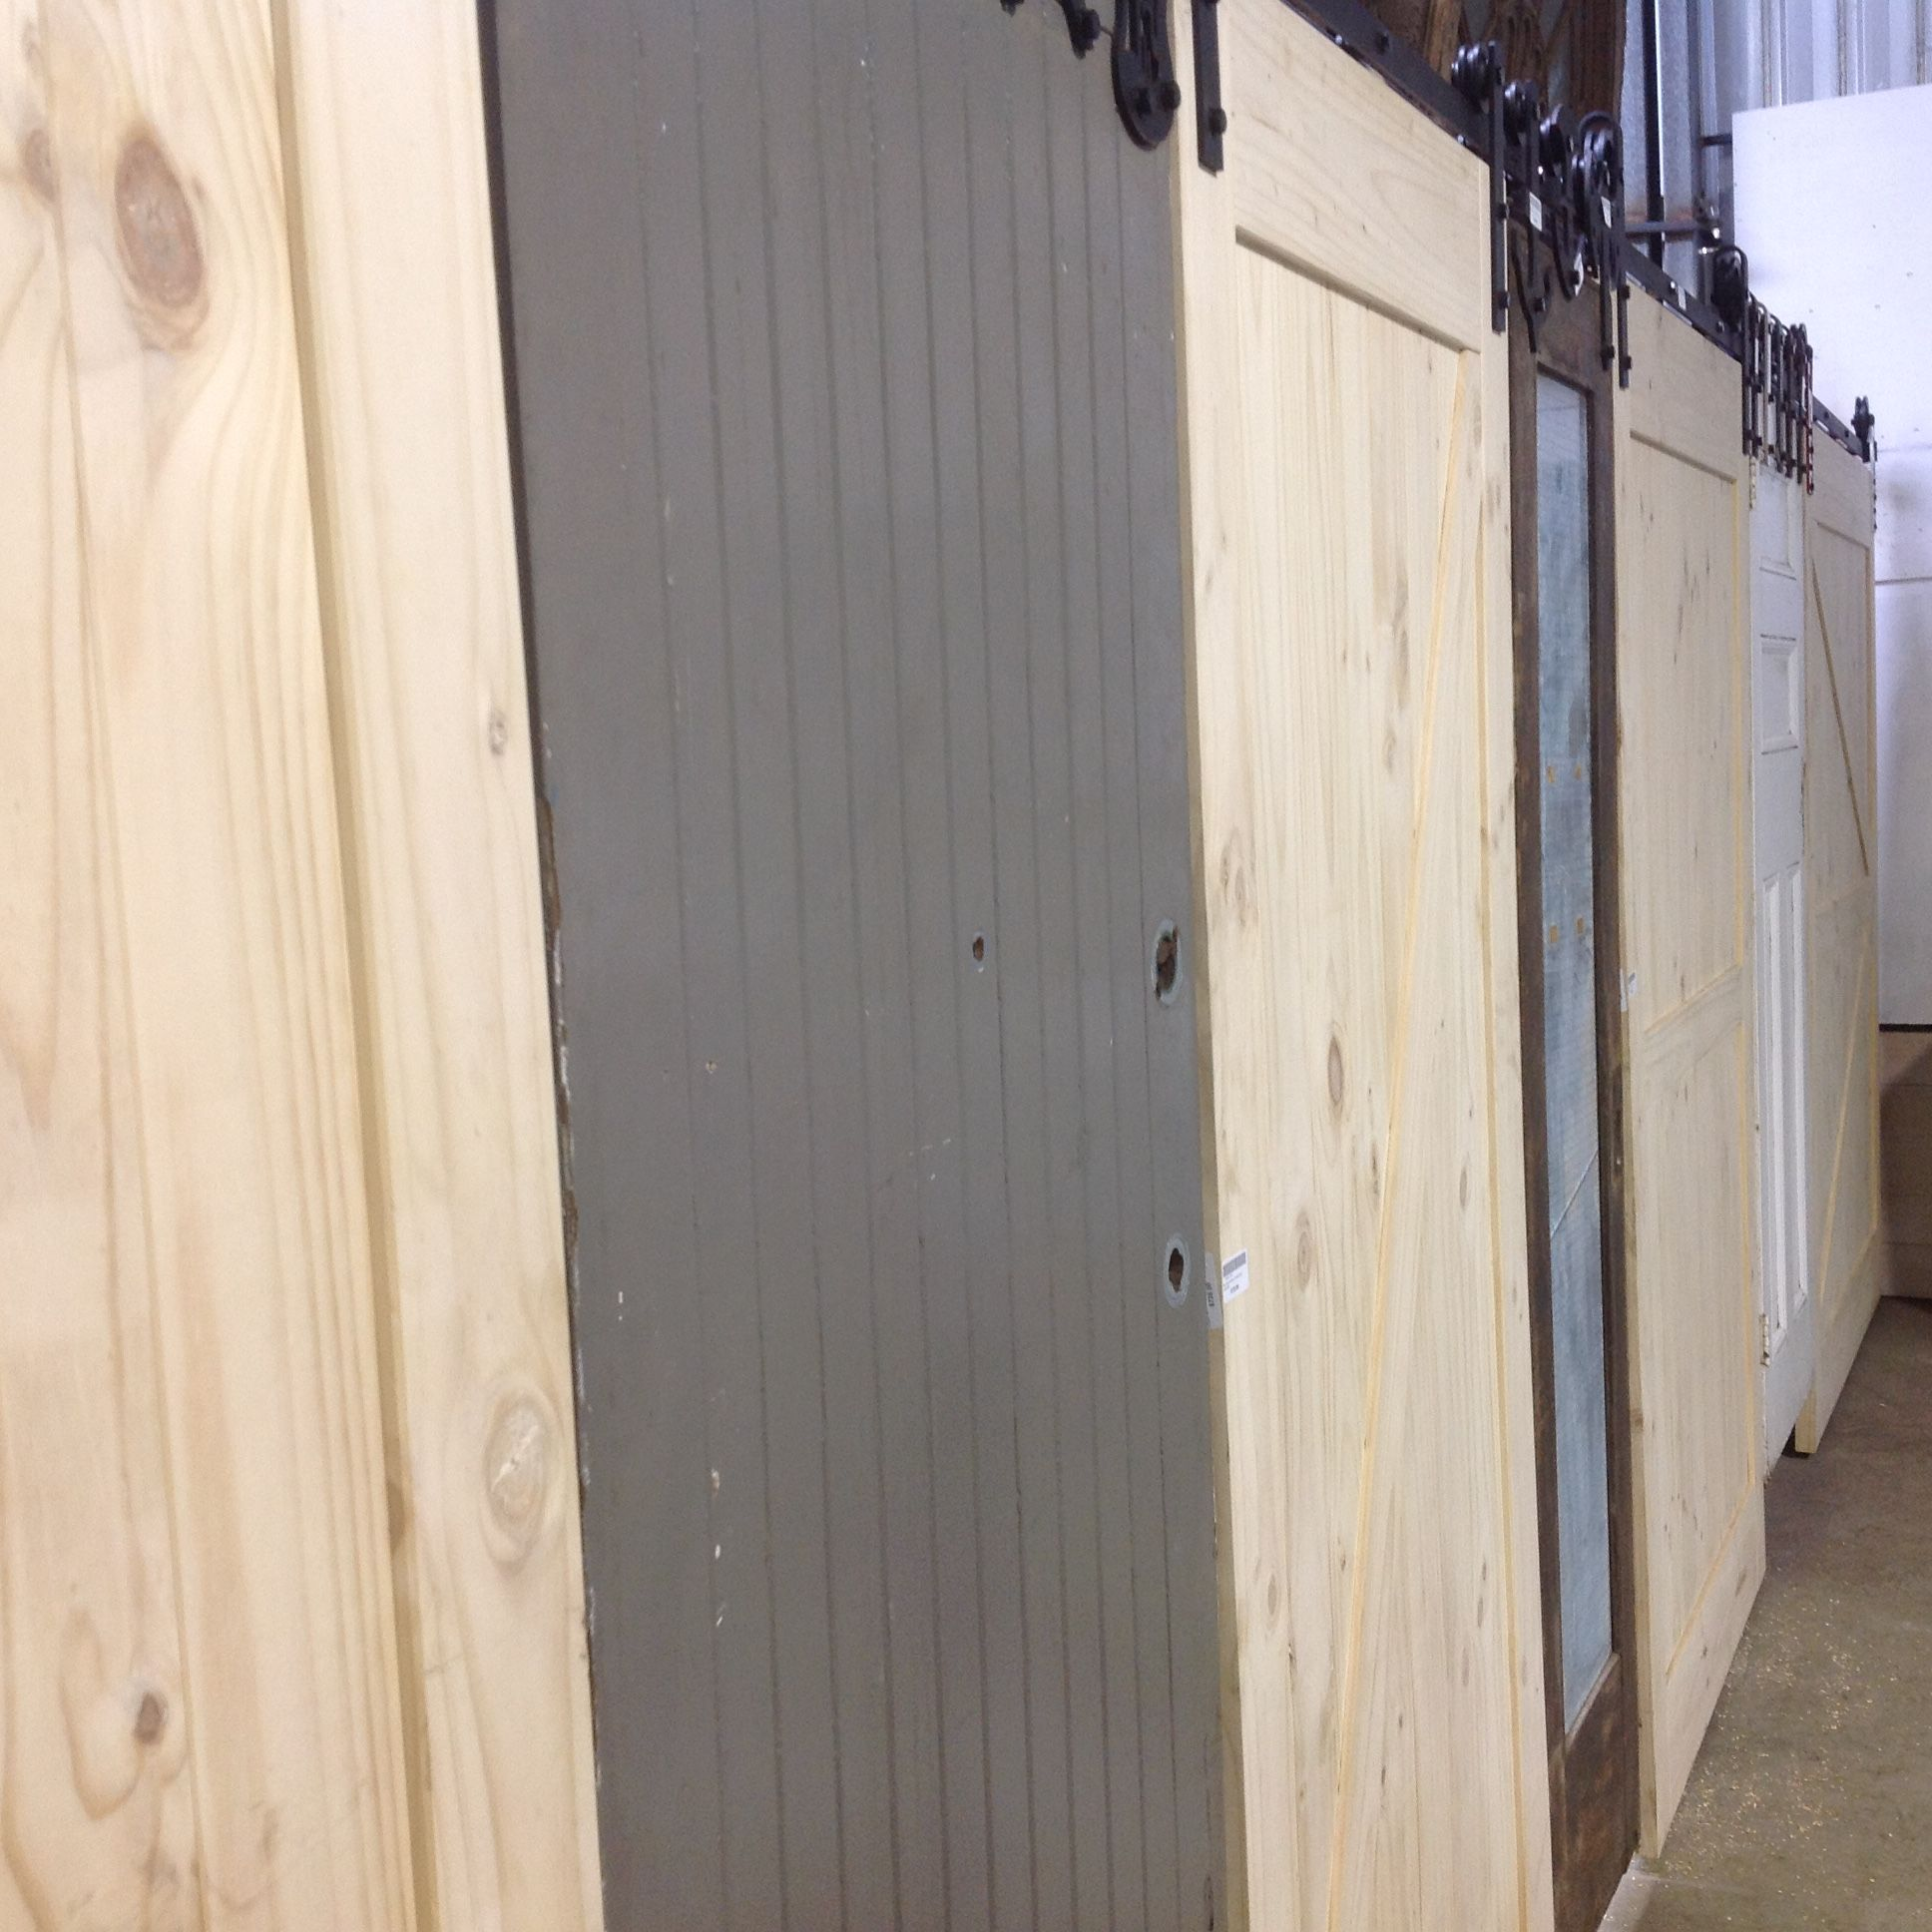 Barn Sliding Doors - You Choose We Supply. & Doors Showroom Sydney u0026 Our Doors \u0026 Windows Were Formally In ... pezcame.com